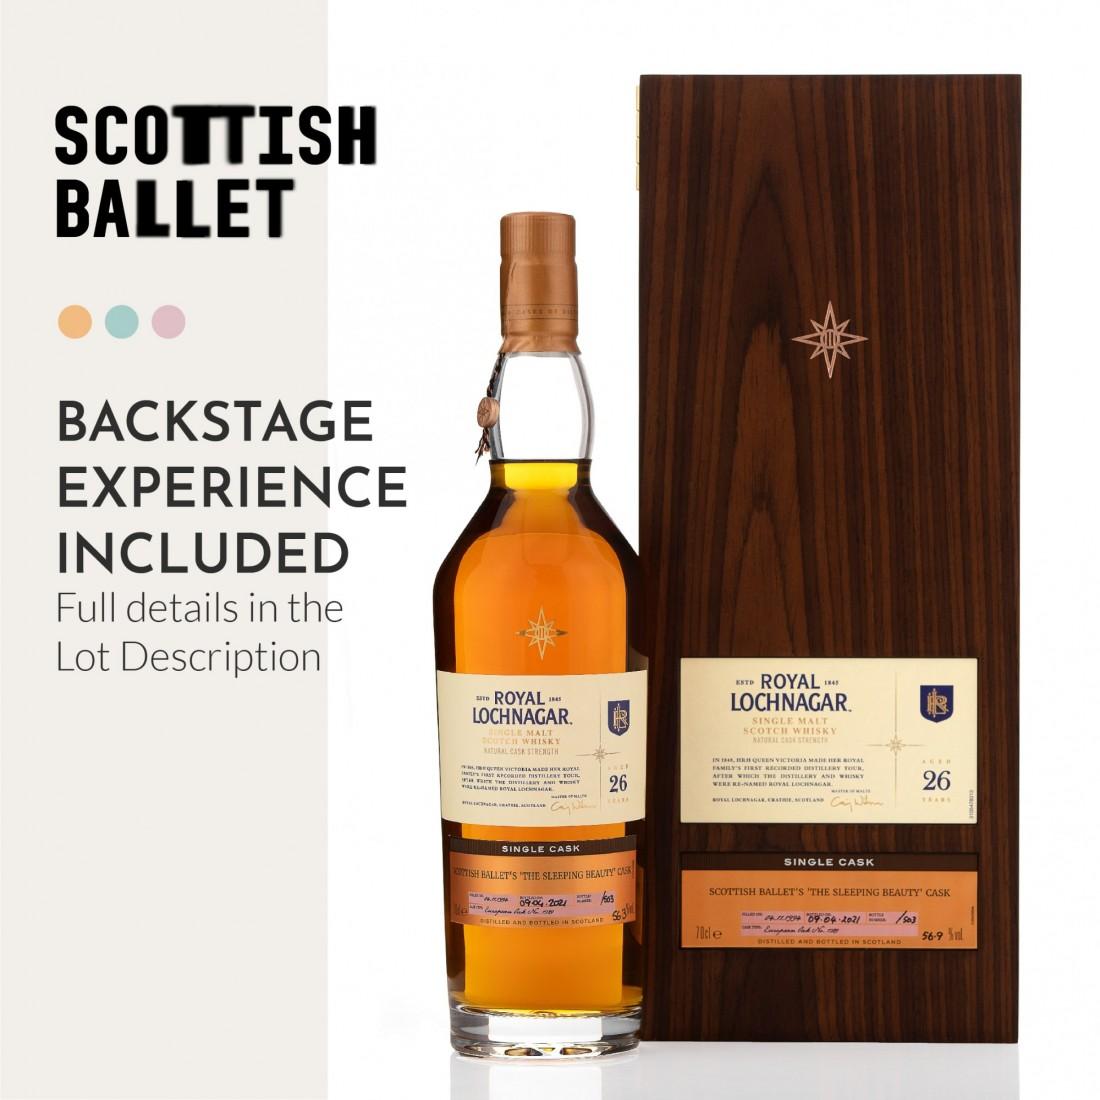 Royal Lochnagar 1994 Casks of Distinction 26 Year Old #1289 / Bottle #007